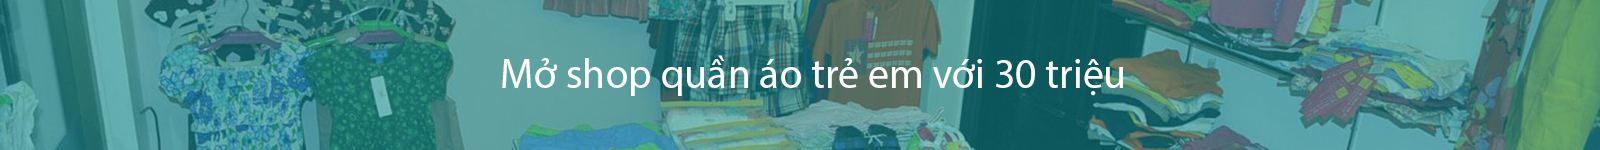 hợp tác mở shop quần áo trẻ em kidstyle